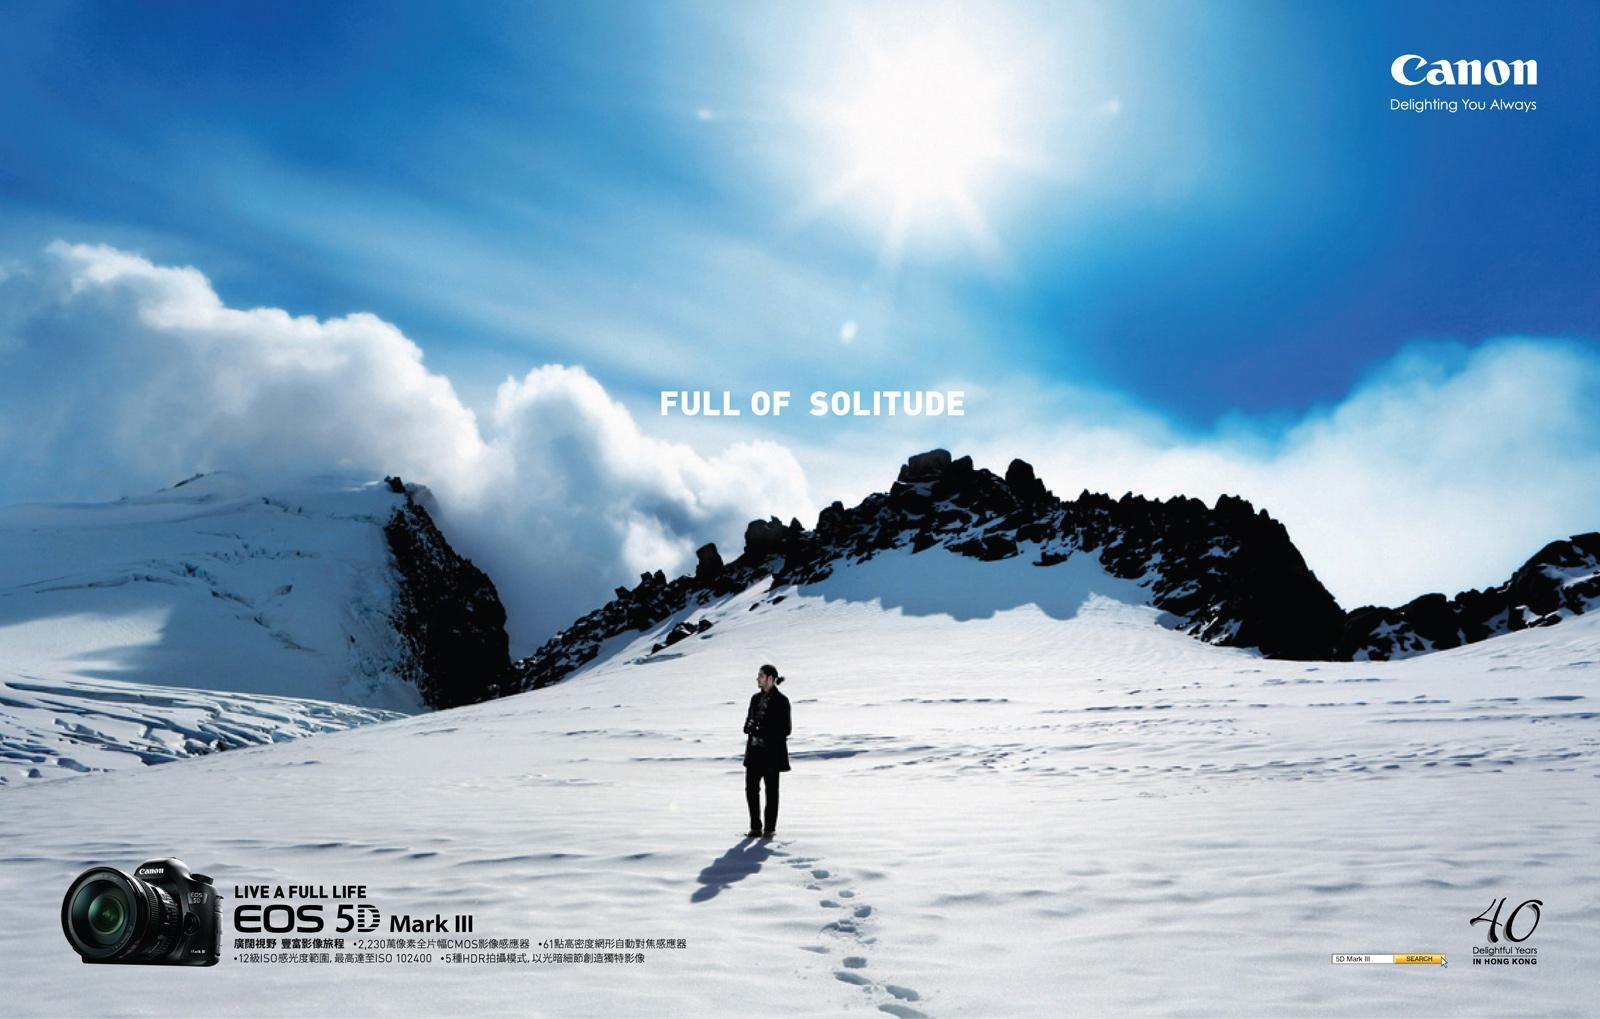 Canon Print Ad -  Live A Full Life, Version B